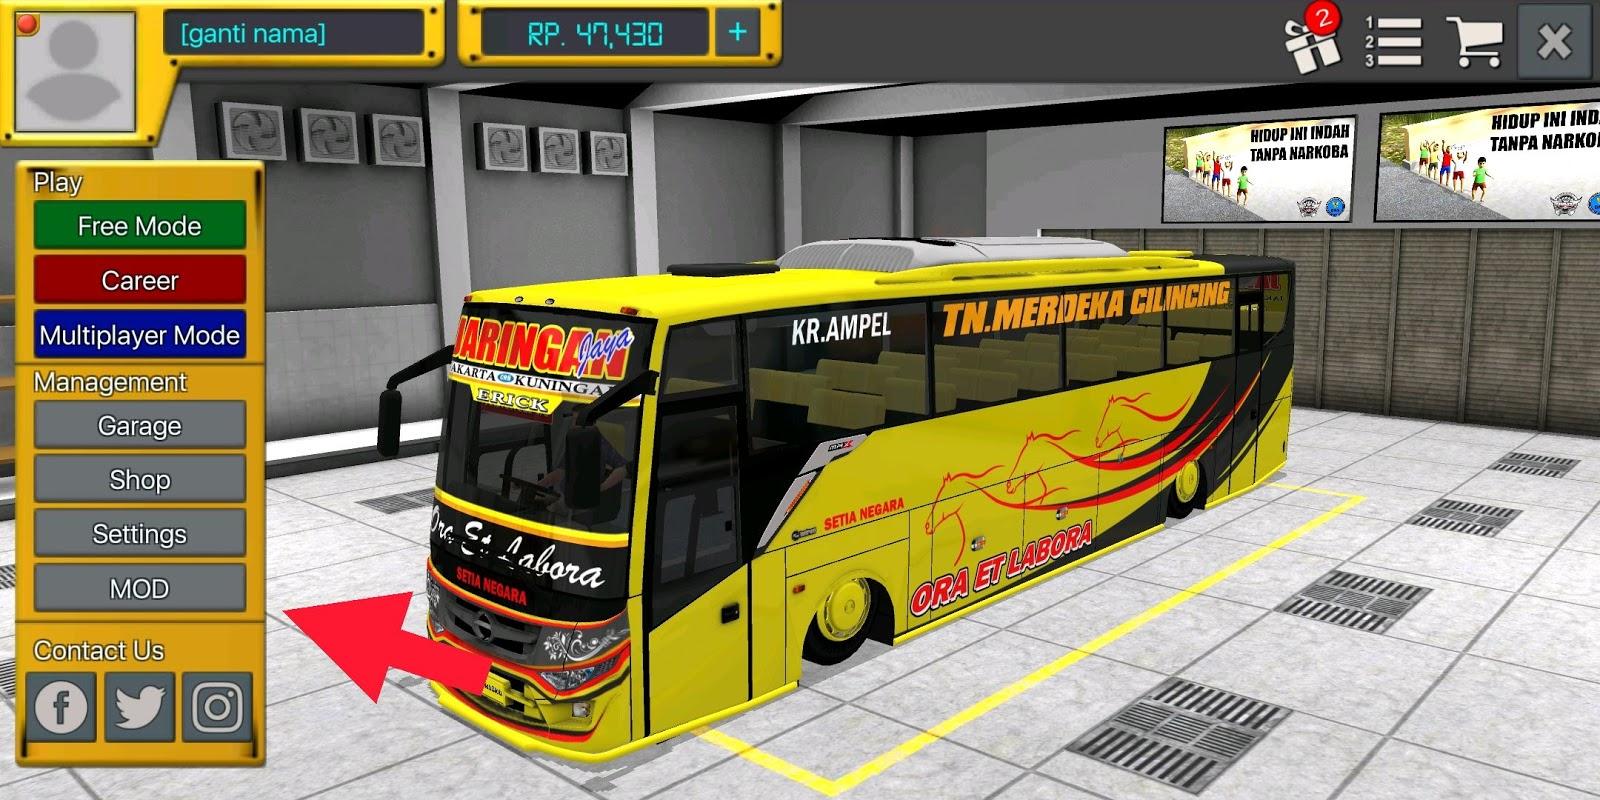 Kumpulan Mod Bus,Truk,Mobil,Livery,Motor dan Alat berat Bussid Terbaru 2020 Tanpa Iklan,Ekstrak dan Tanpa Pasword